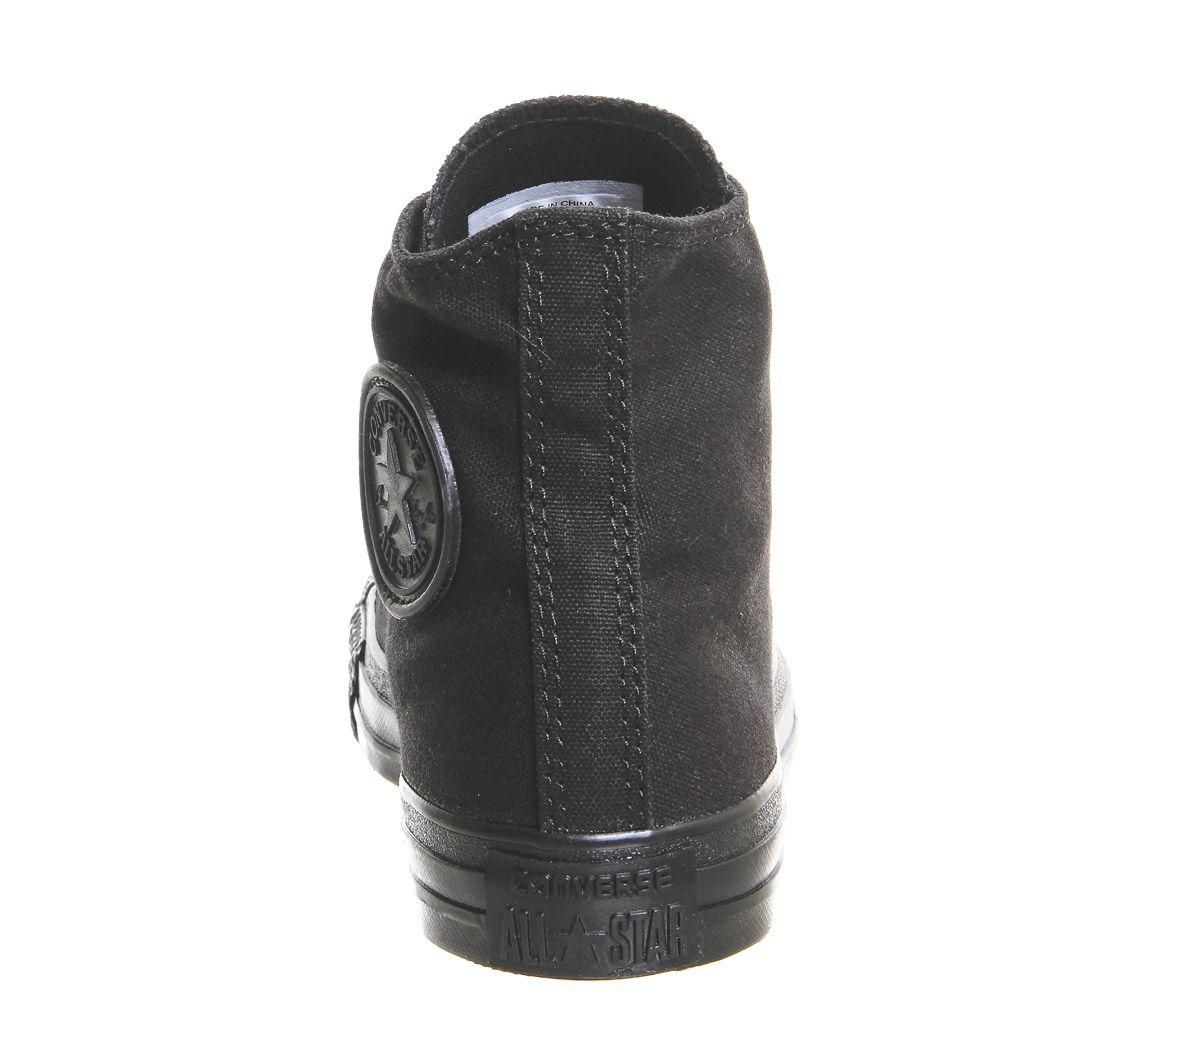 Womens-Converse-All-Star-Hi-Flash-Black-Mono-Trainers-Shoes thumbnail 3